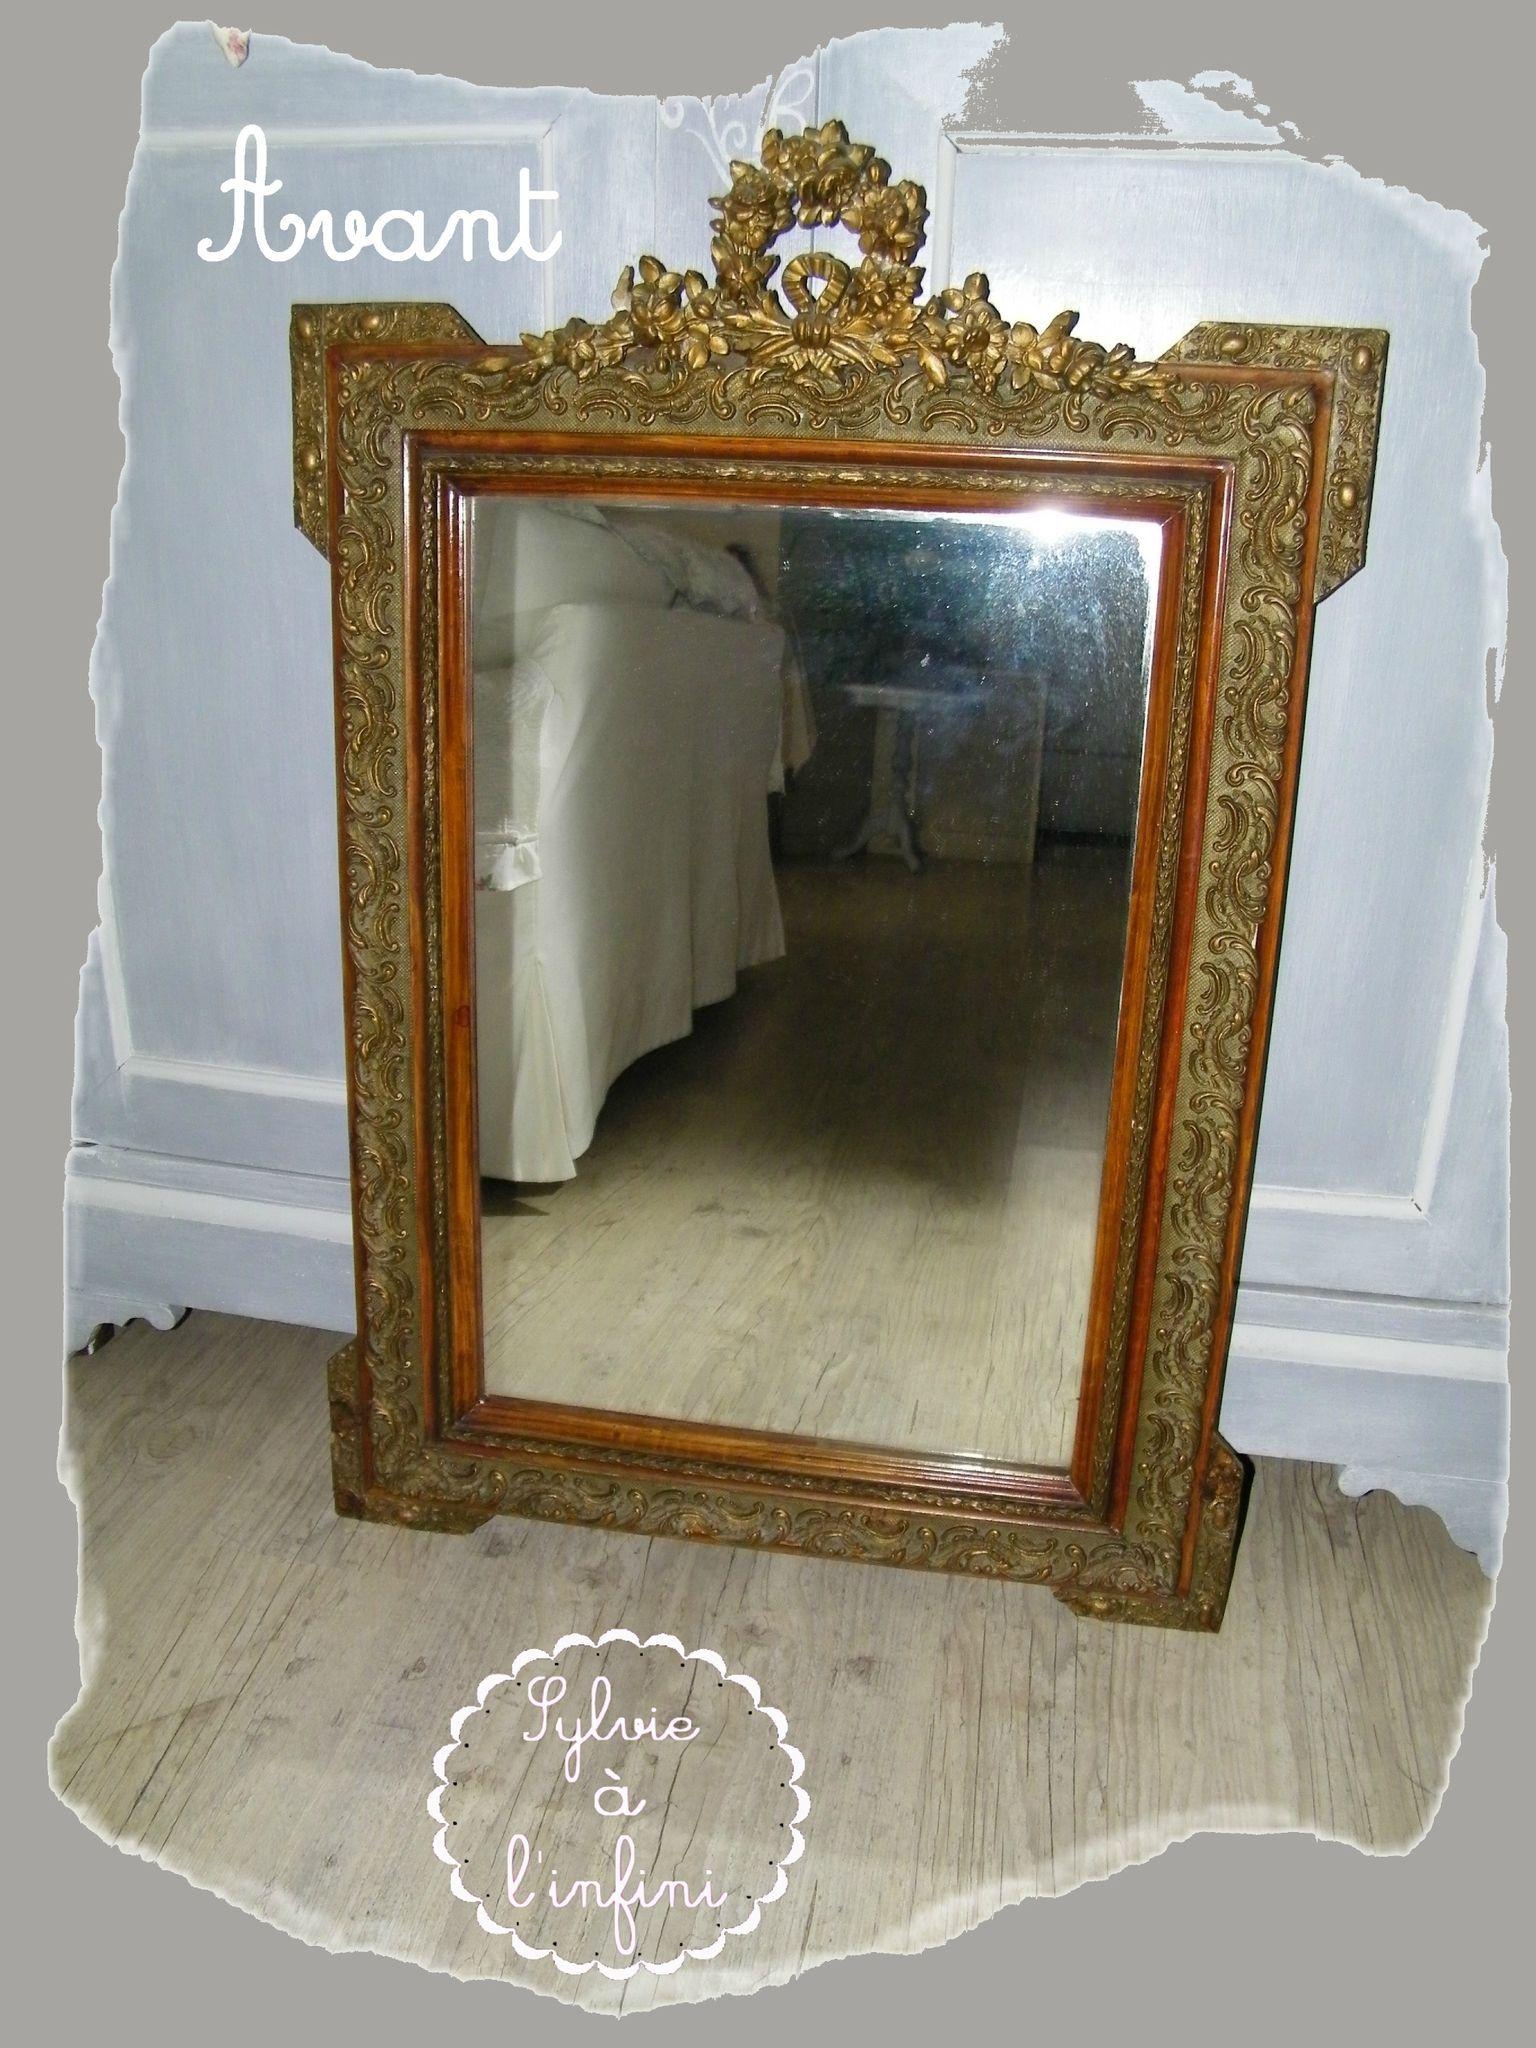 Customiser Un Cadre De Miroir relookage de cadre de miroir ancien esprit gustavien & son